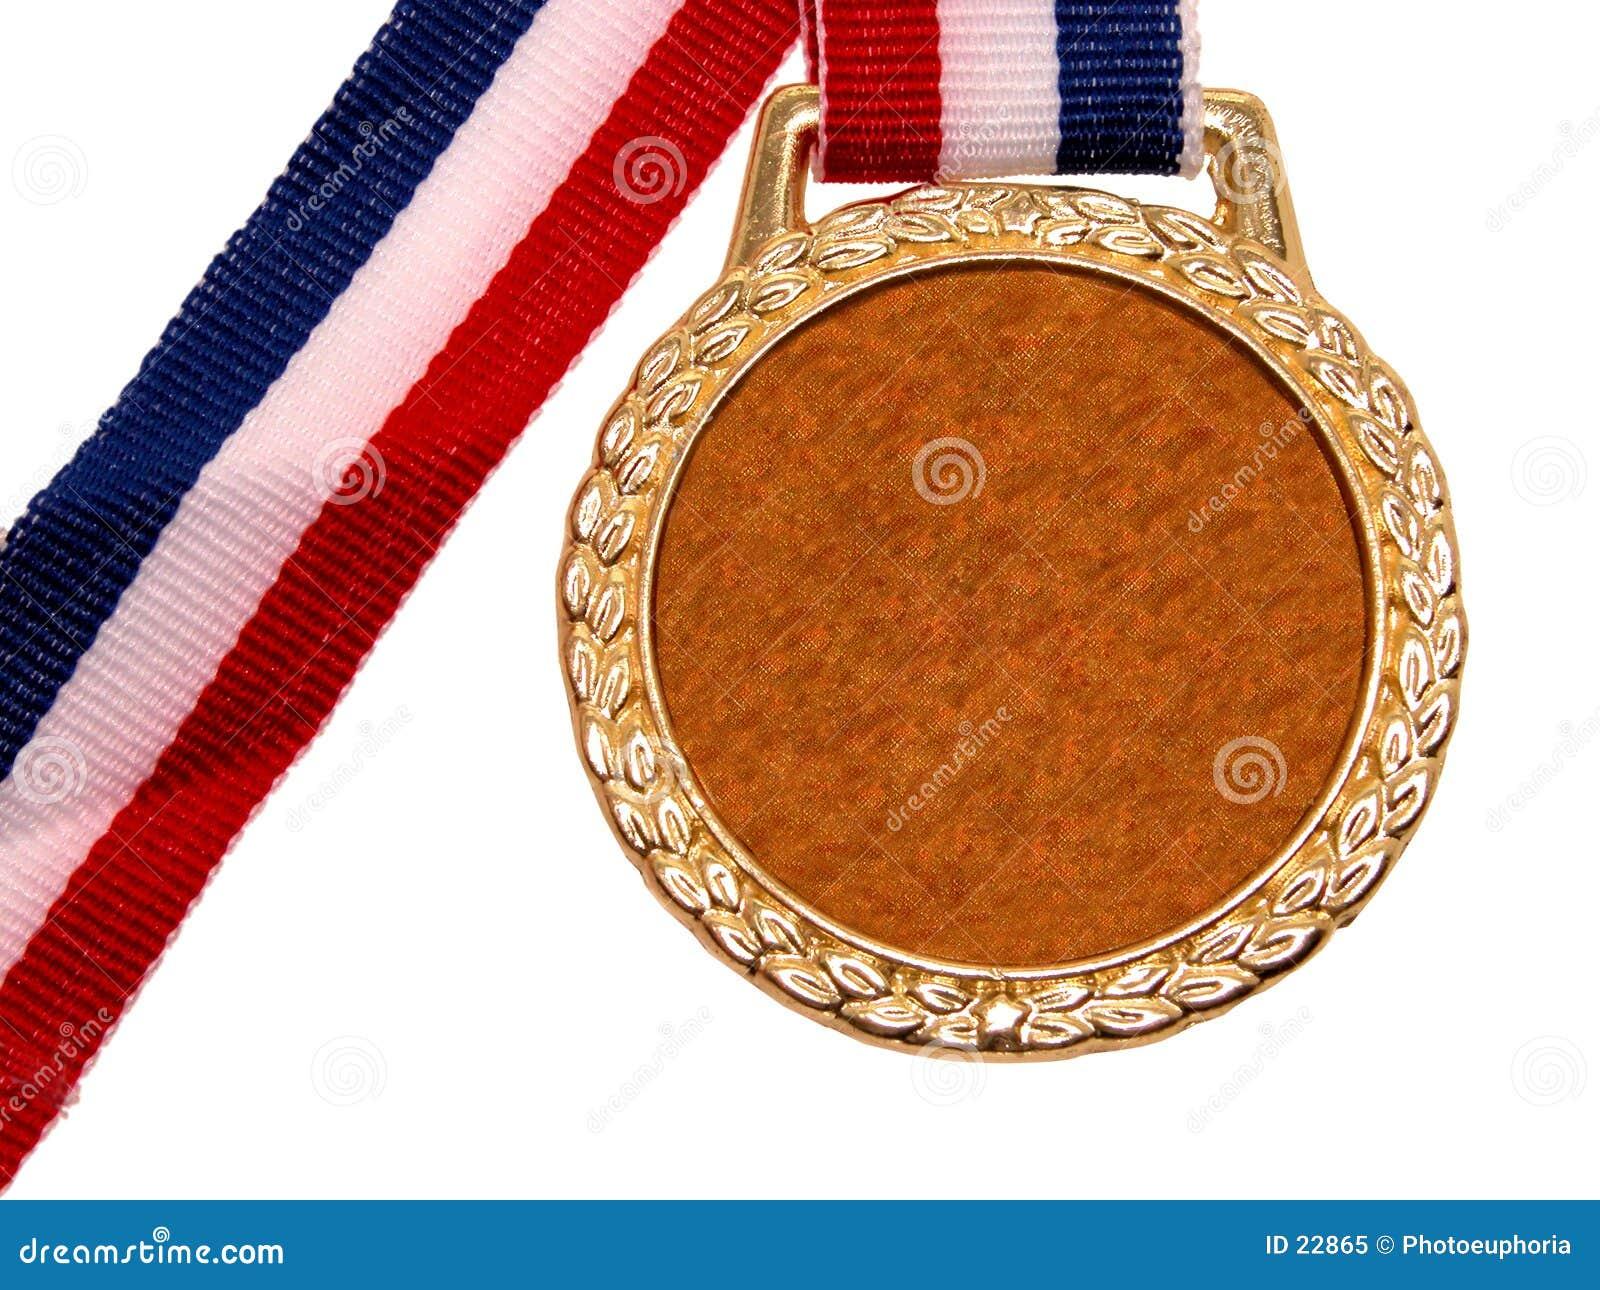 1 blanka guldmedalj 2